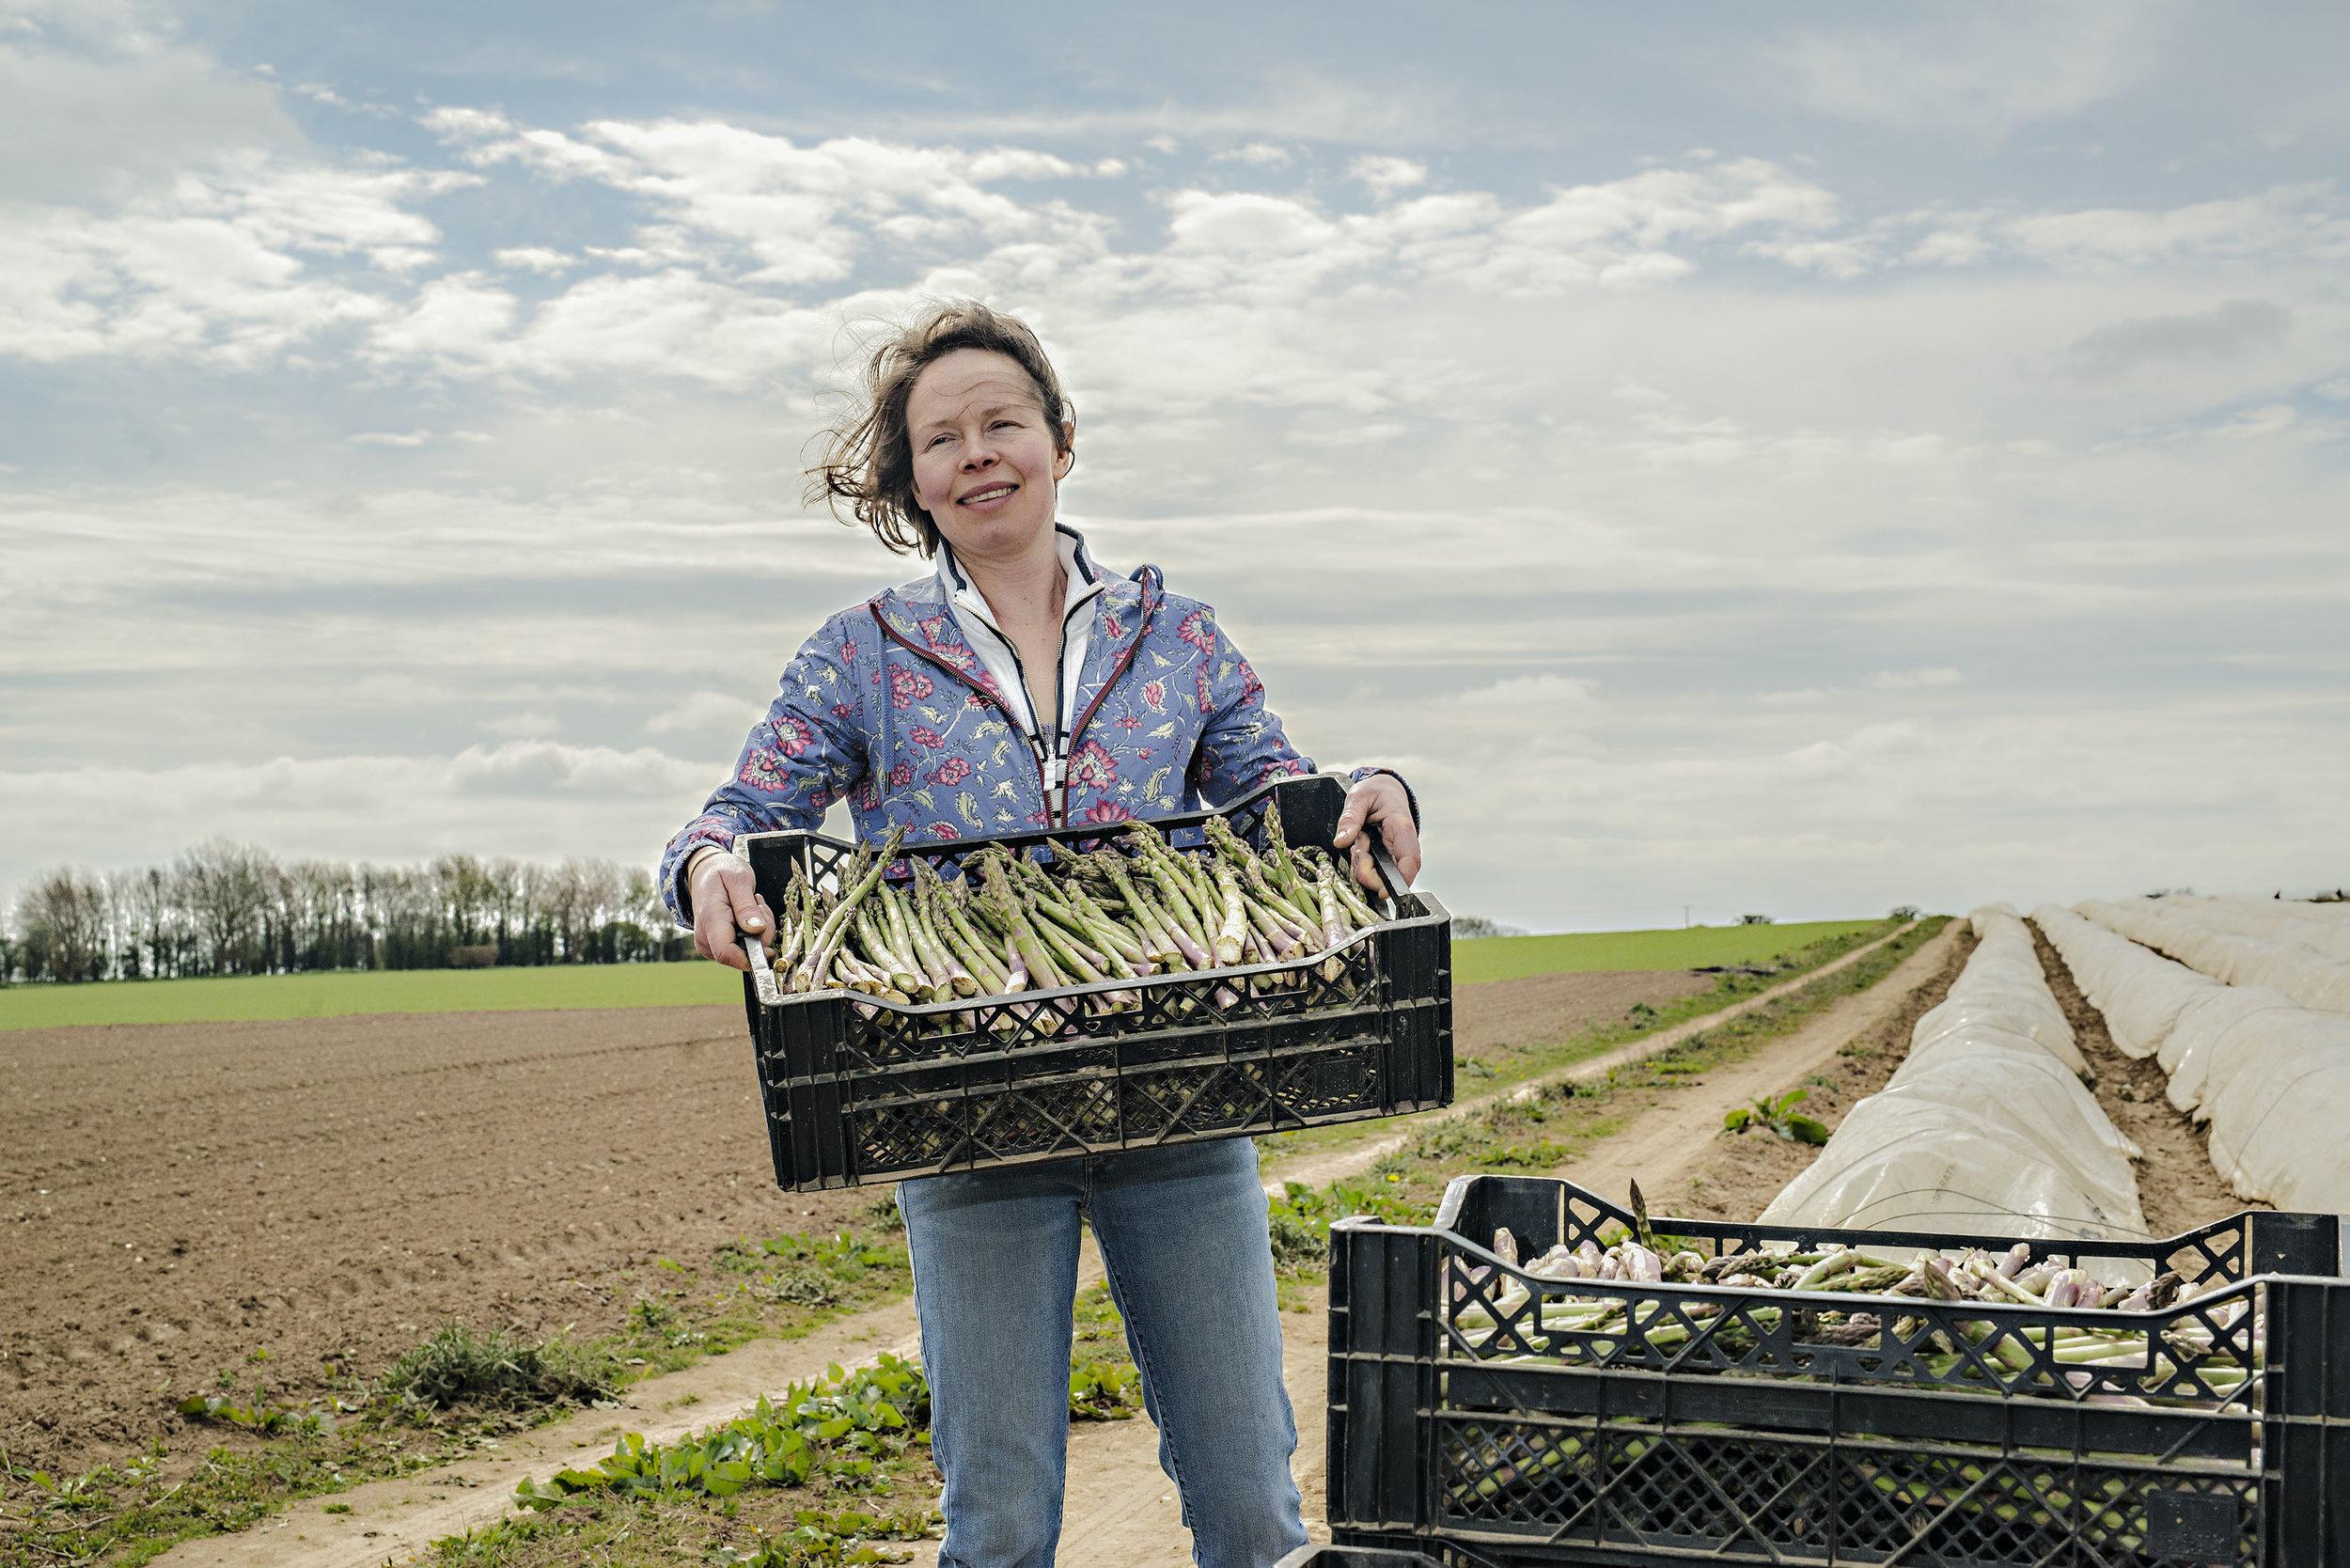 Asparagus grower Emma Tacon on her farm in Great Yarmouth.